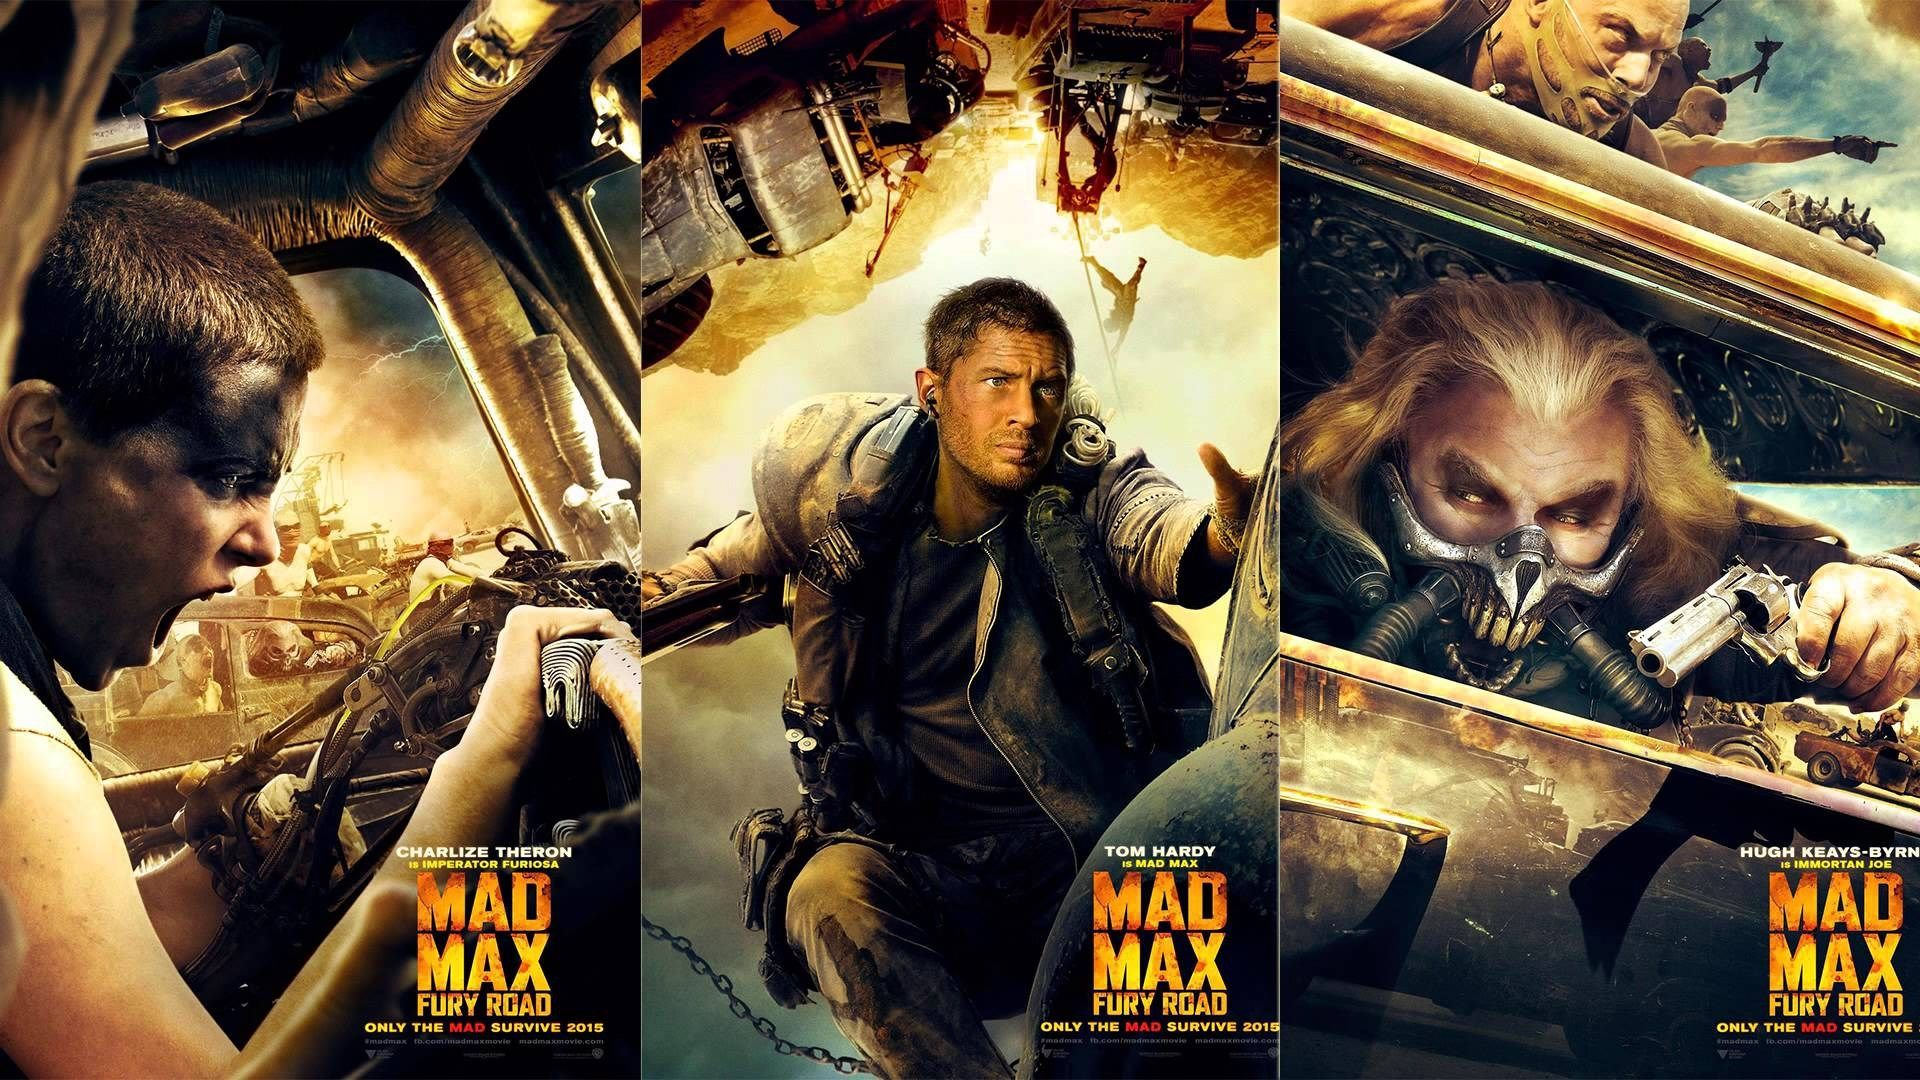 Bramley Kingsman Computer Wallpaper For Mad Max Fury Road